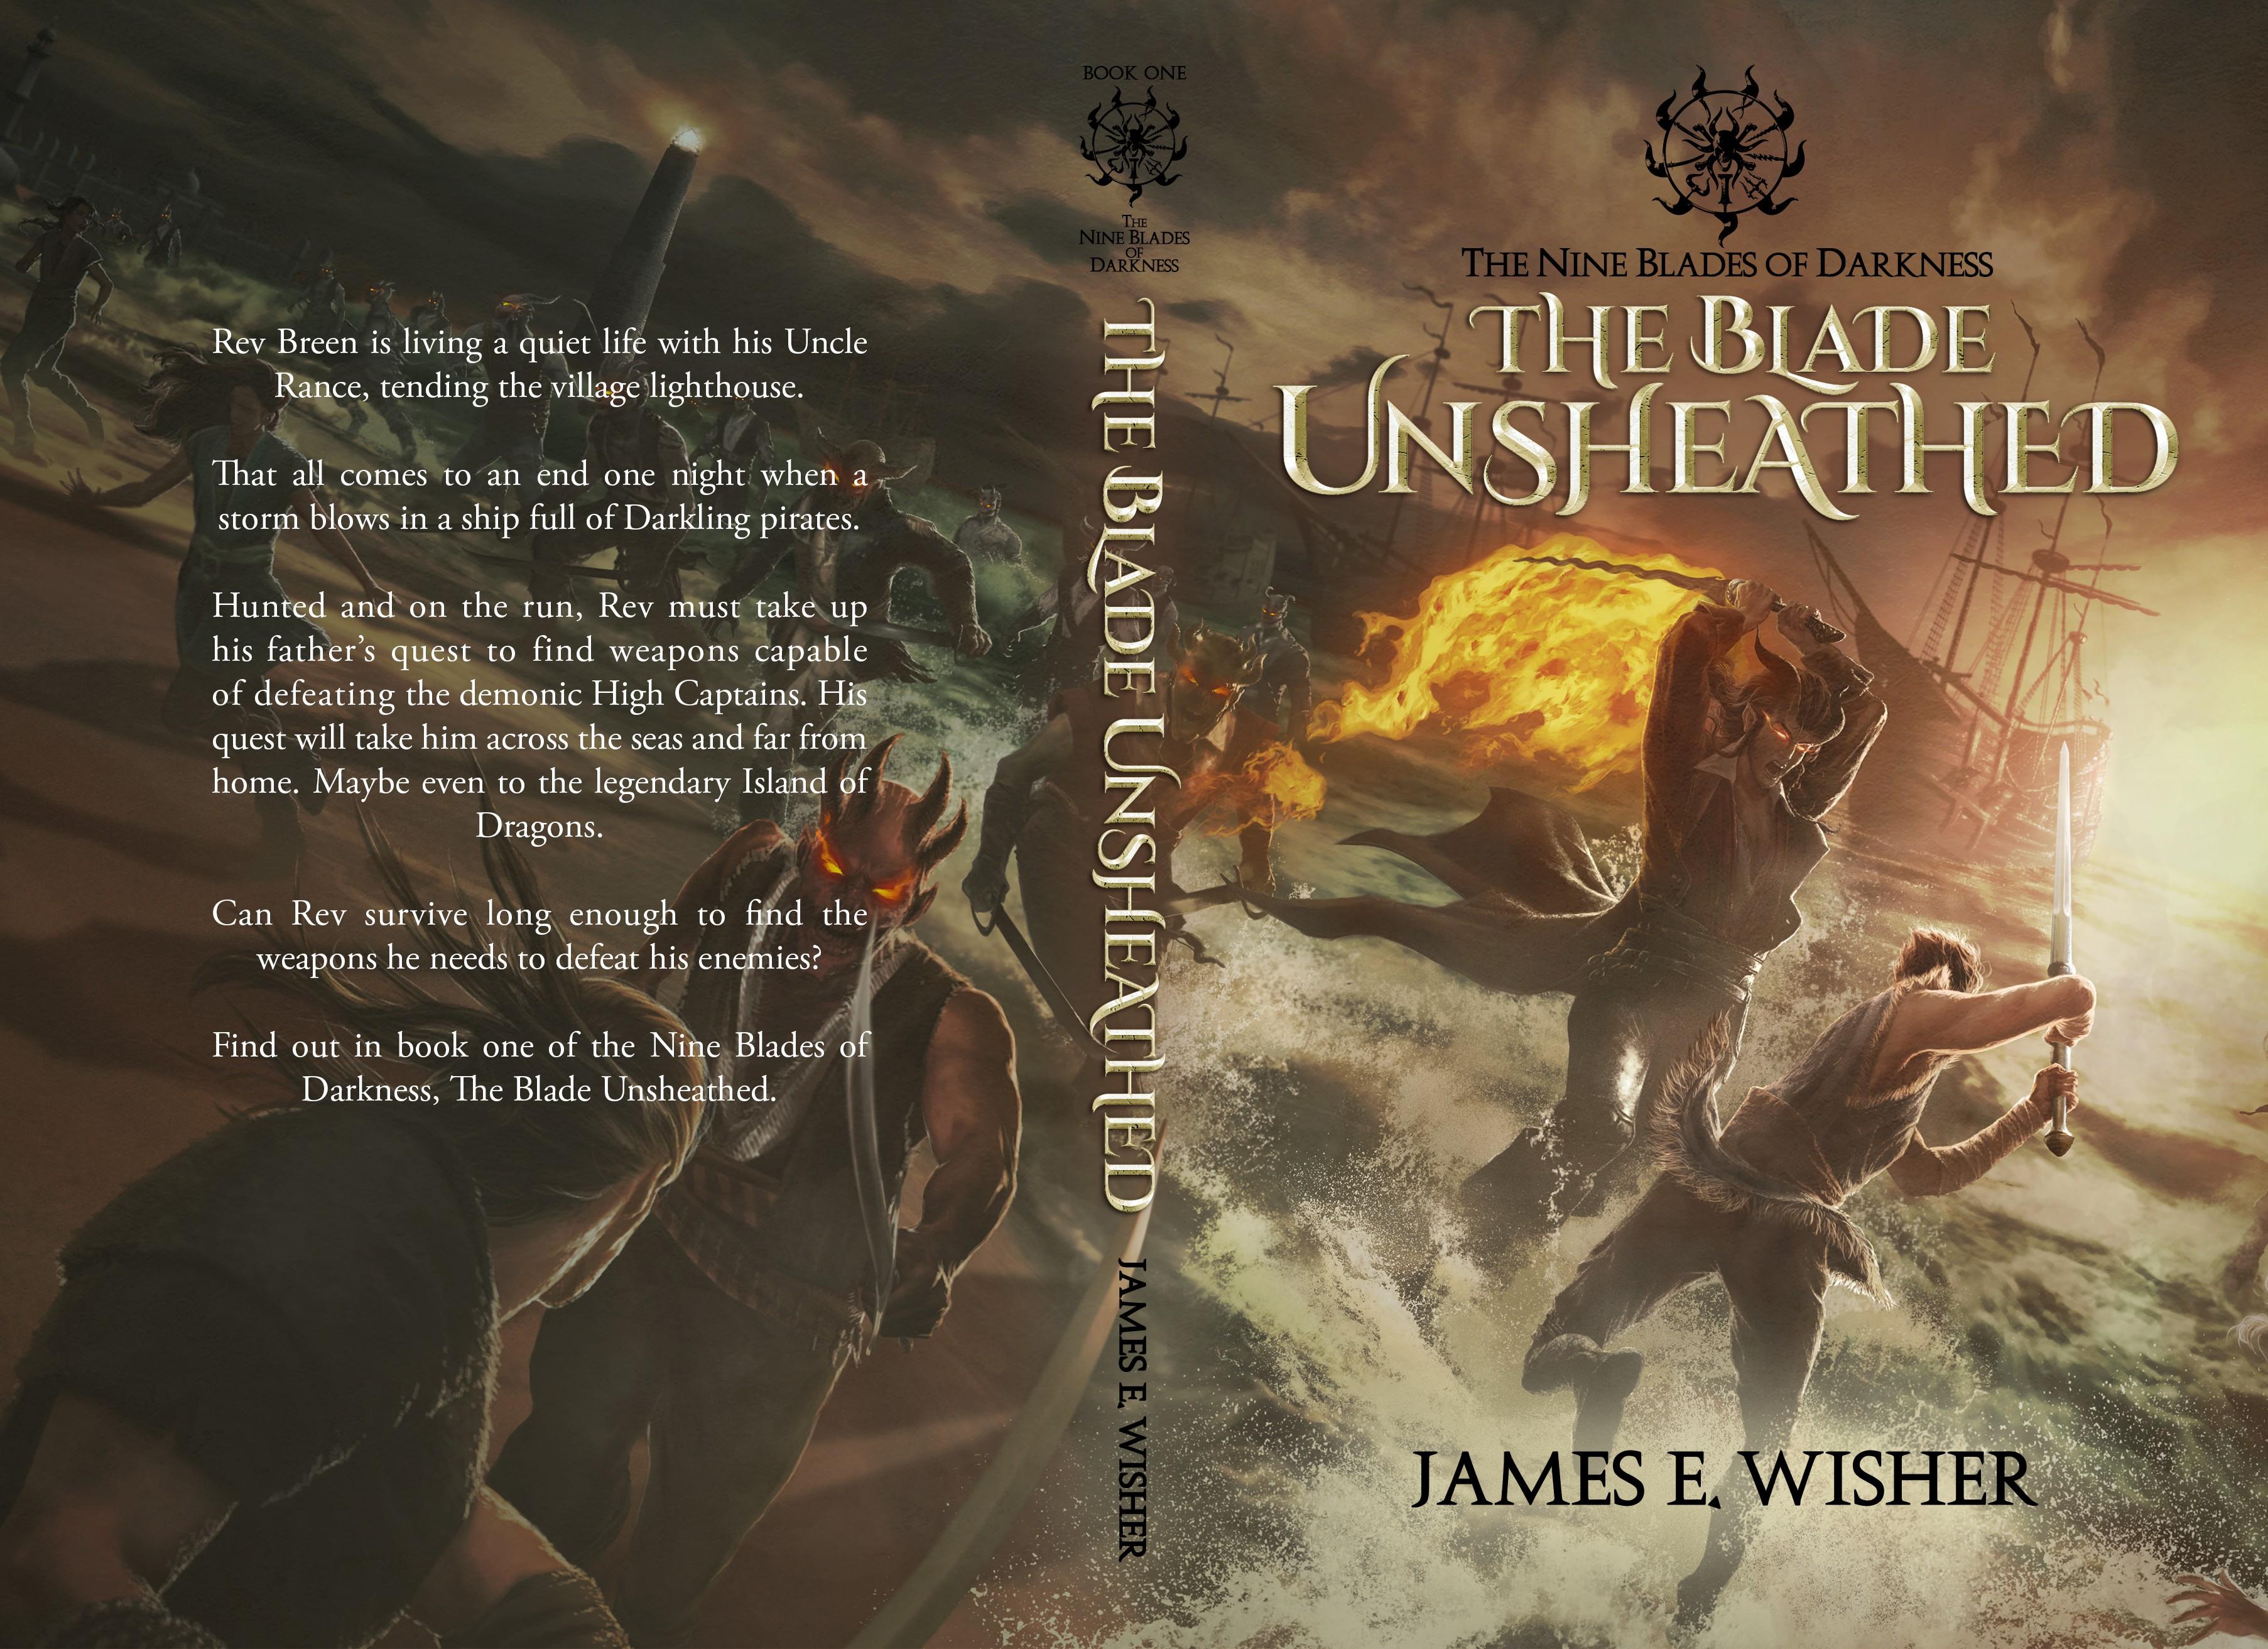 The Nine Blades of Darkness Art